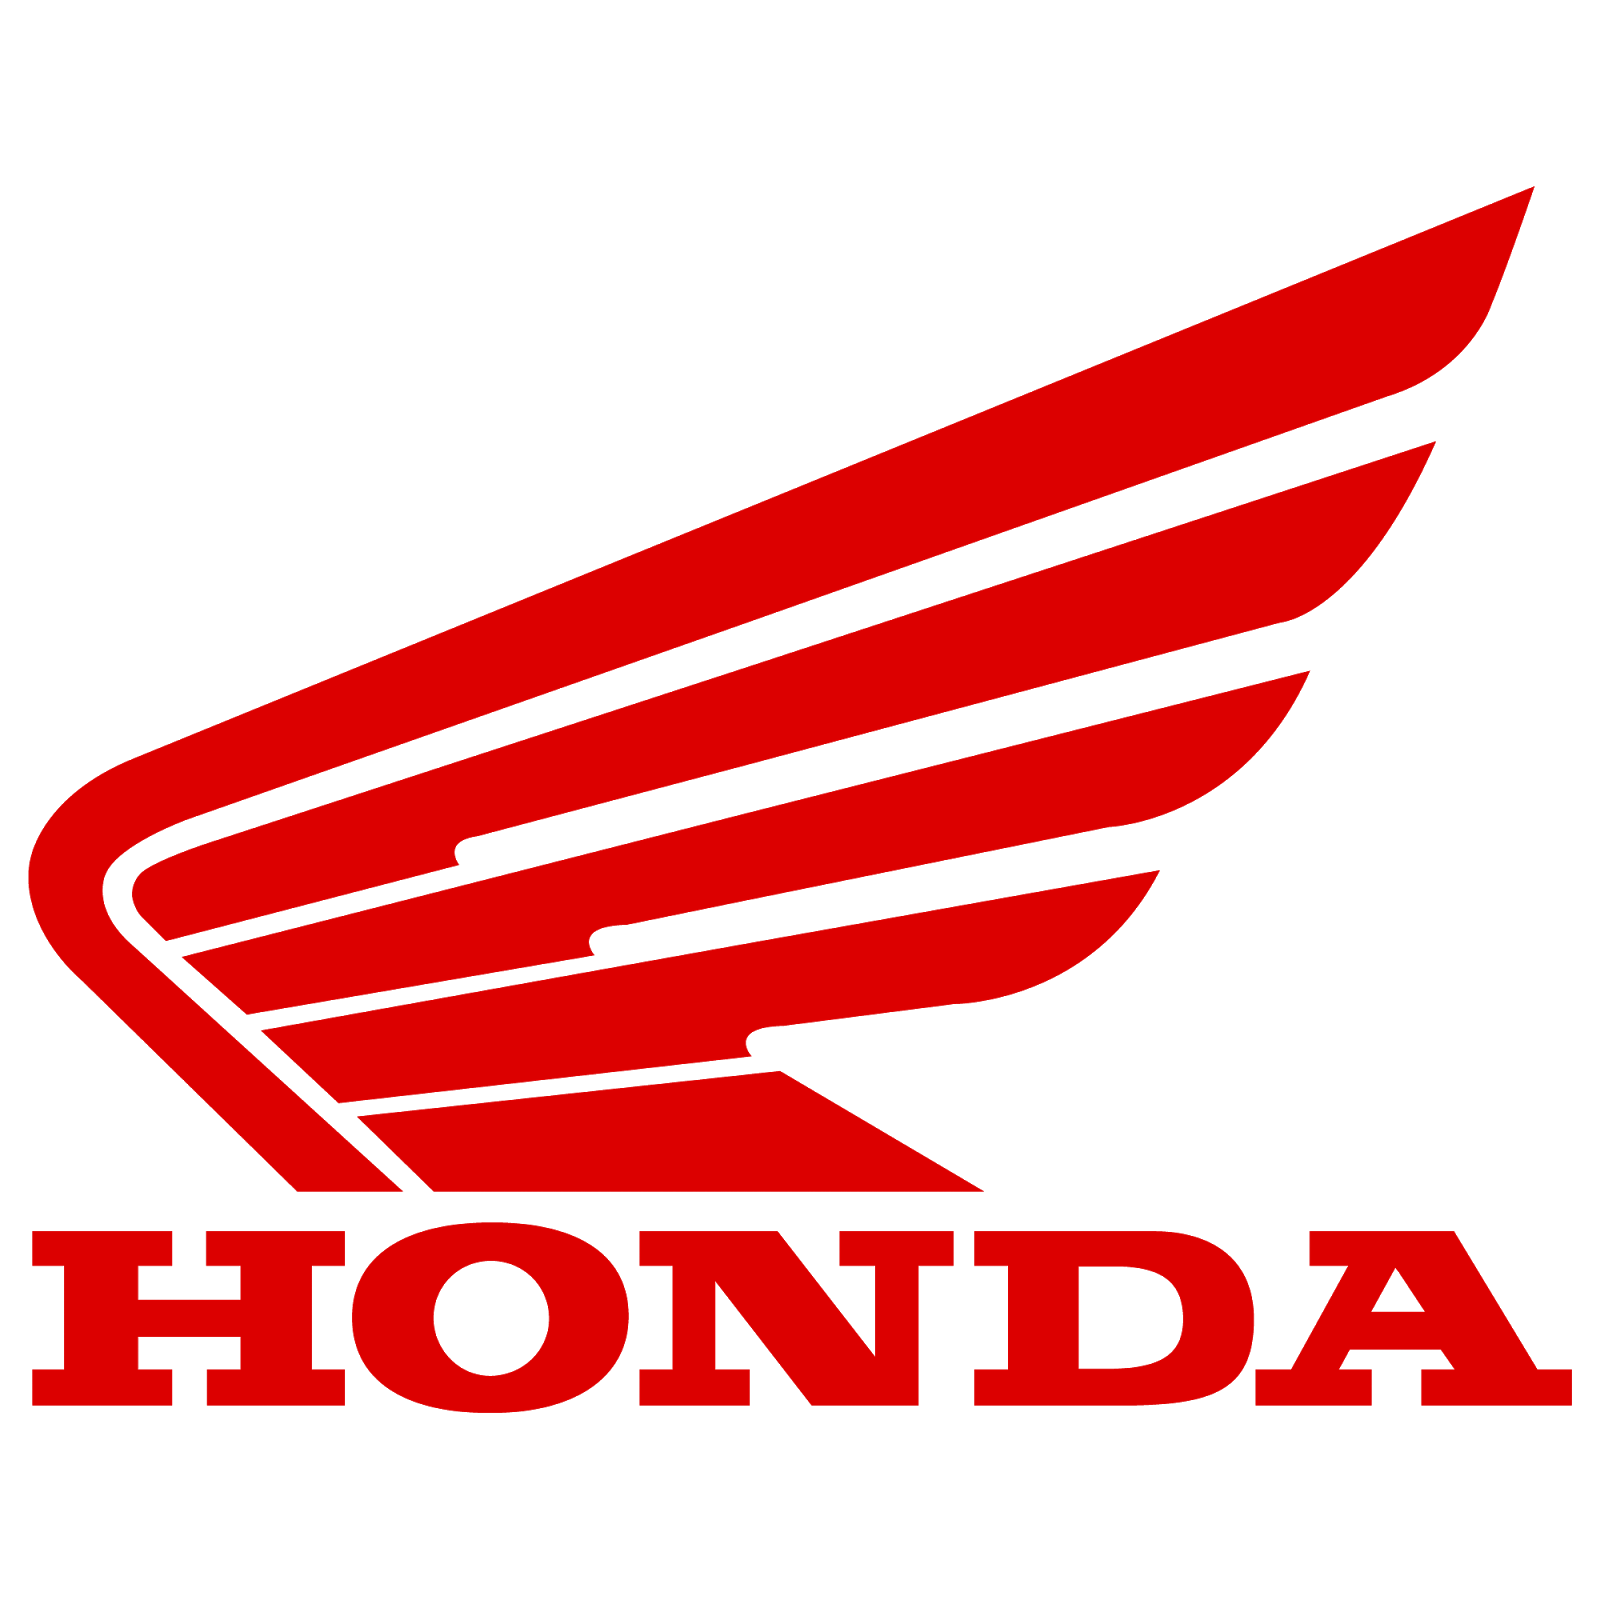 Lowongan Kerja Colombo Baru (Counter Sales, Staff Admin, Asisten Mekanik Dealer, Asisten Mekanik Bengkel) – Yogyakarta